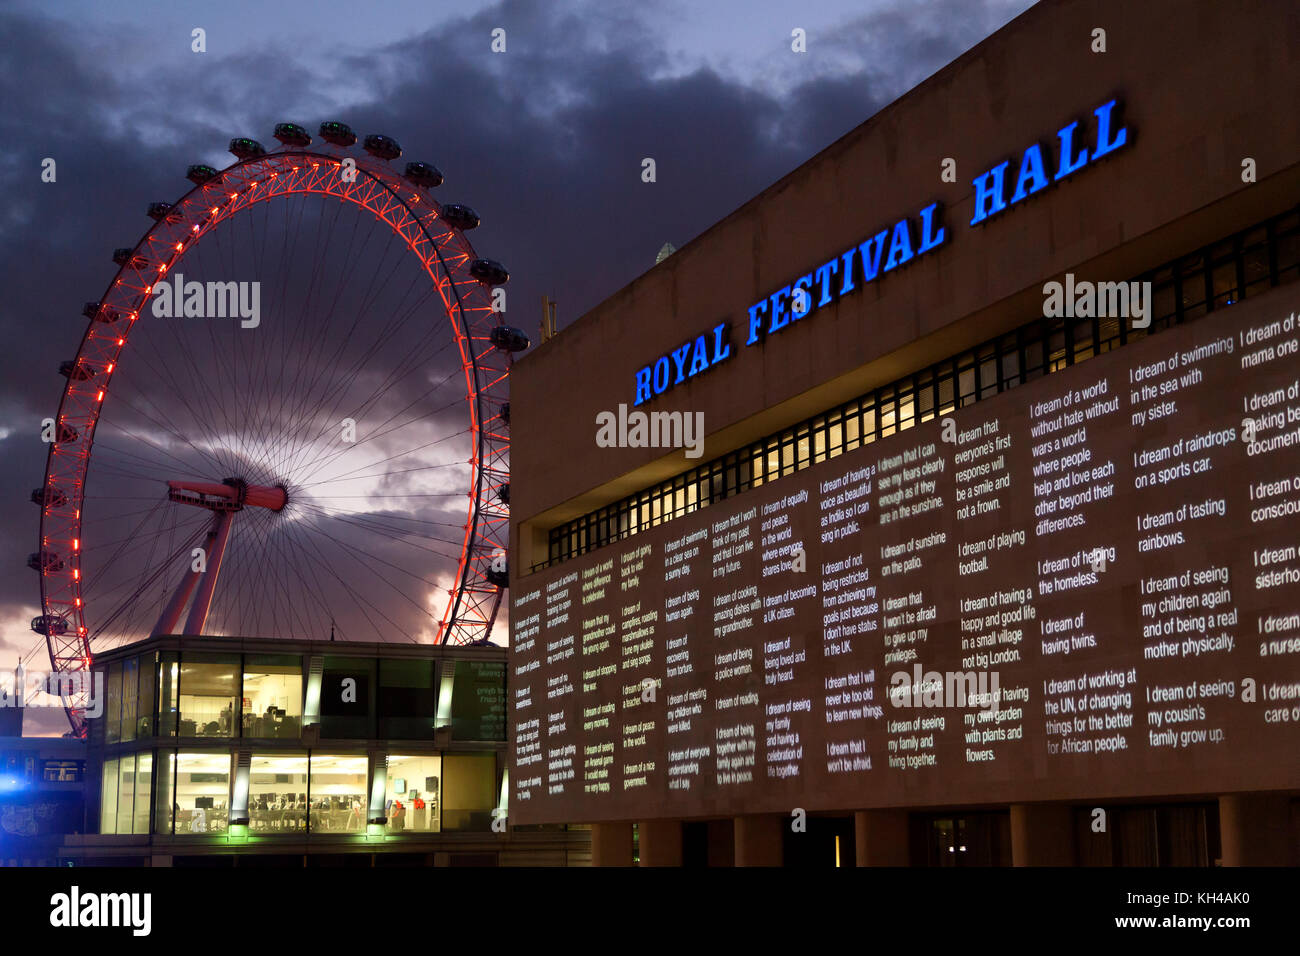 London Eye and Royal Festival Hall at dusk - Stock Image